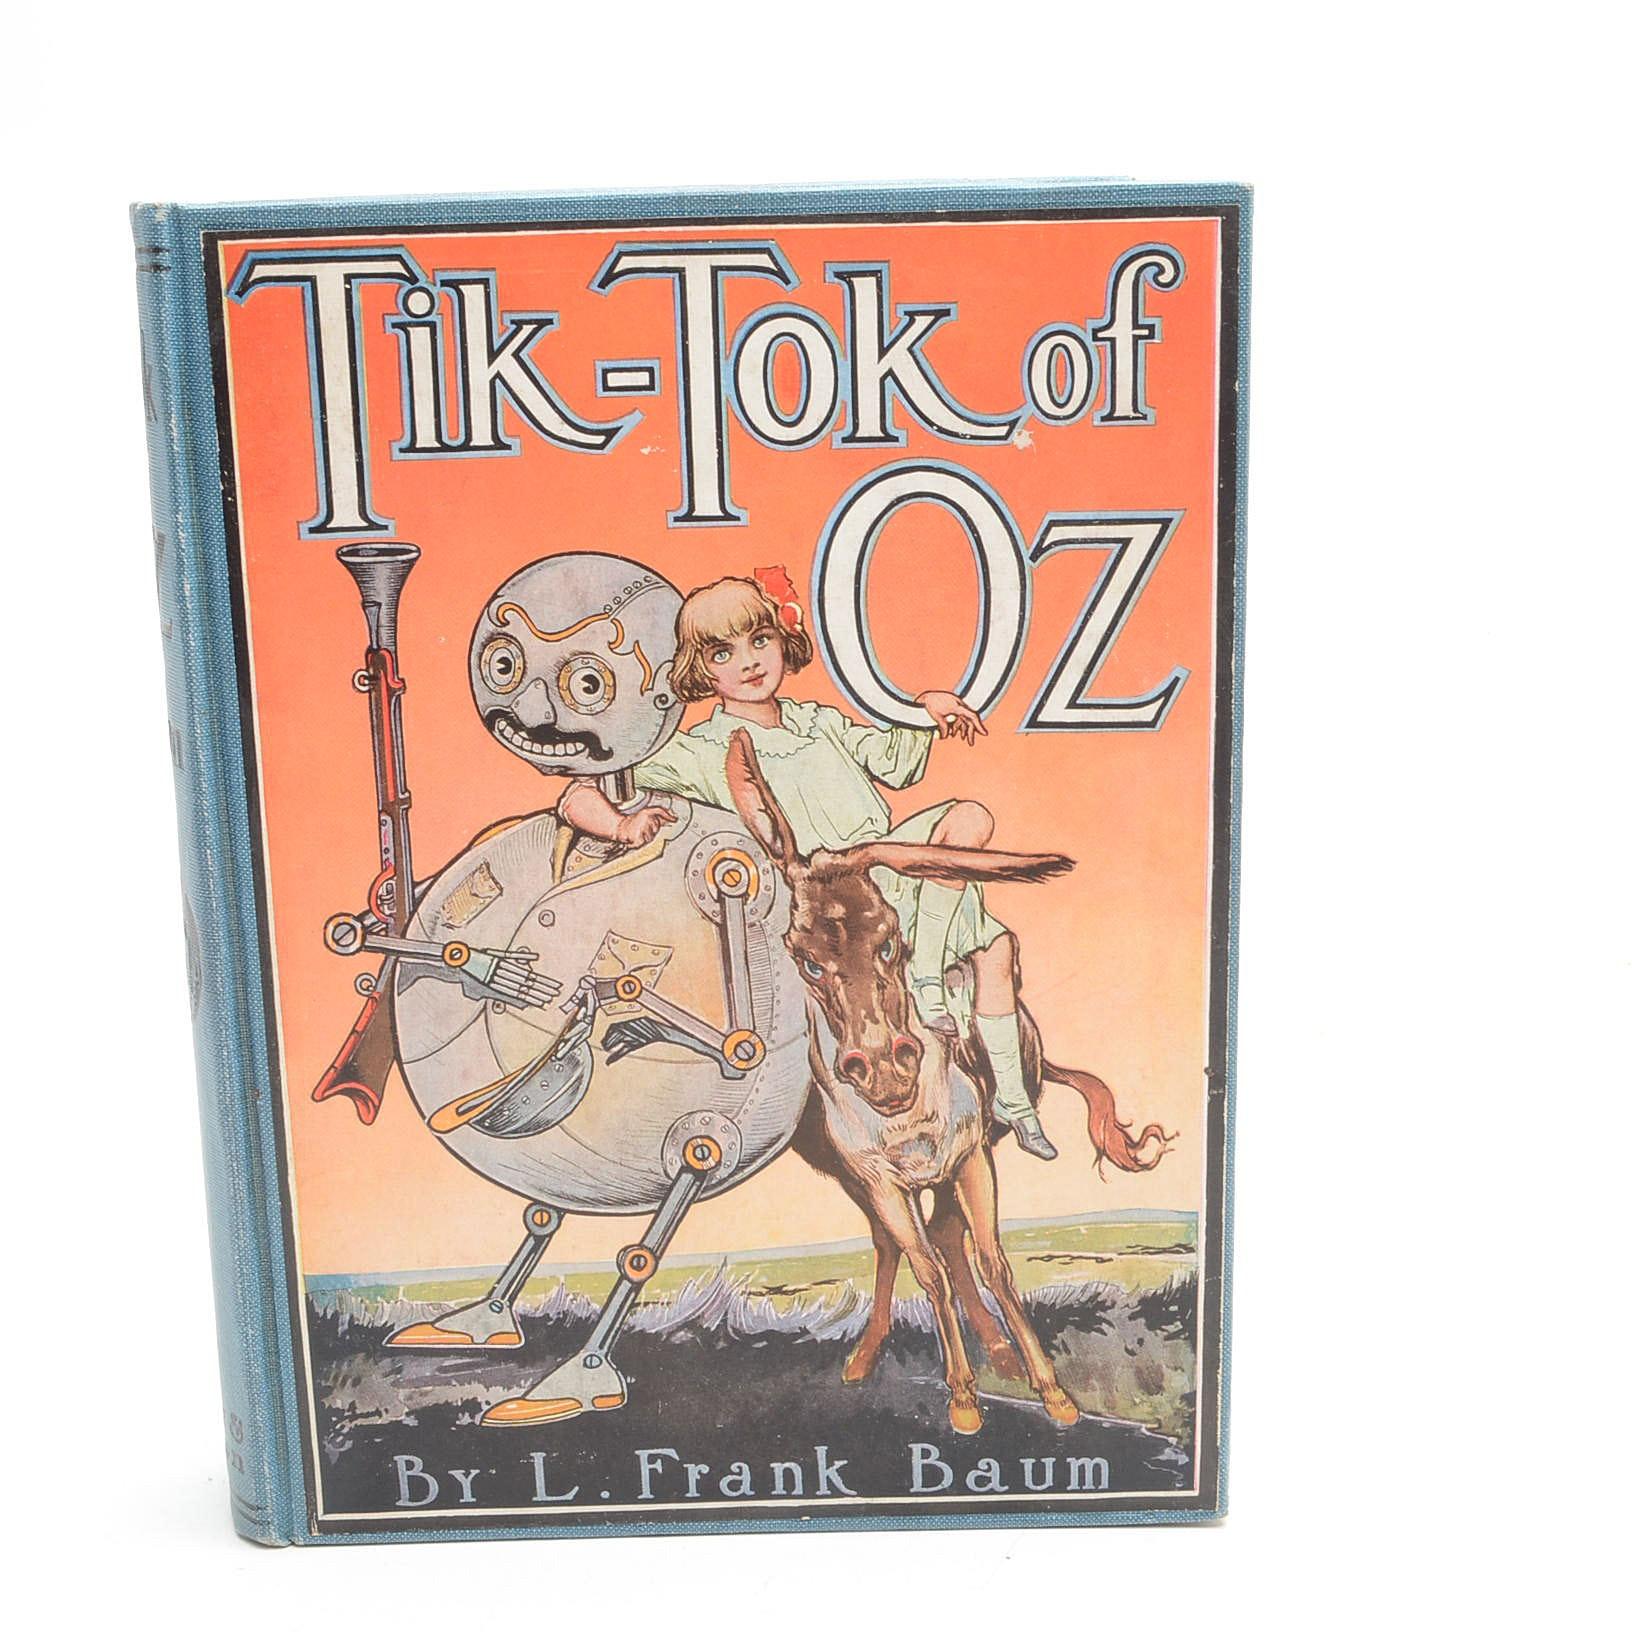 "Circa 1920 Edition of ""Tik-Tok of Oz"" by L. Frank Baum"